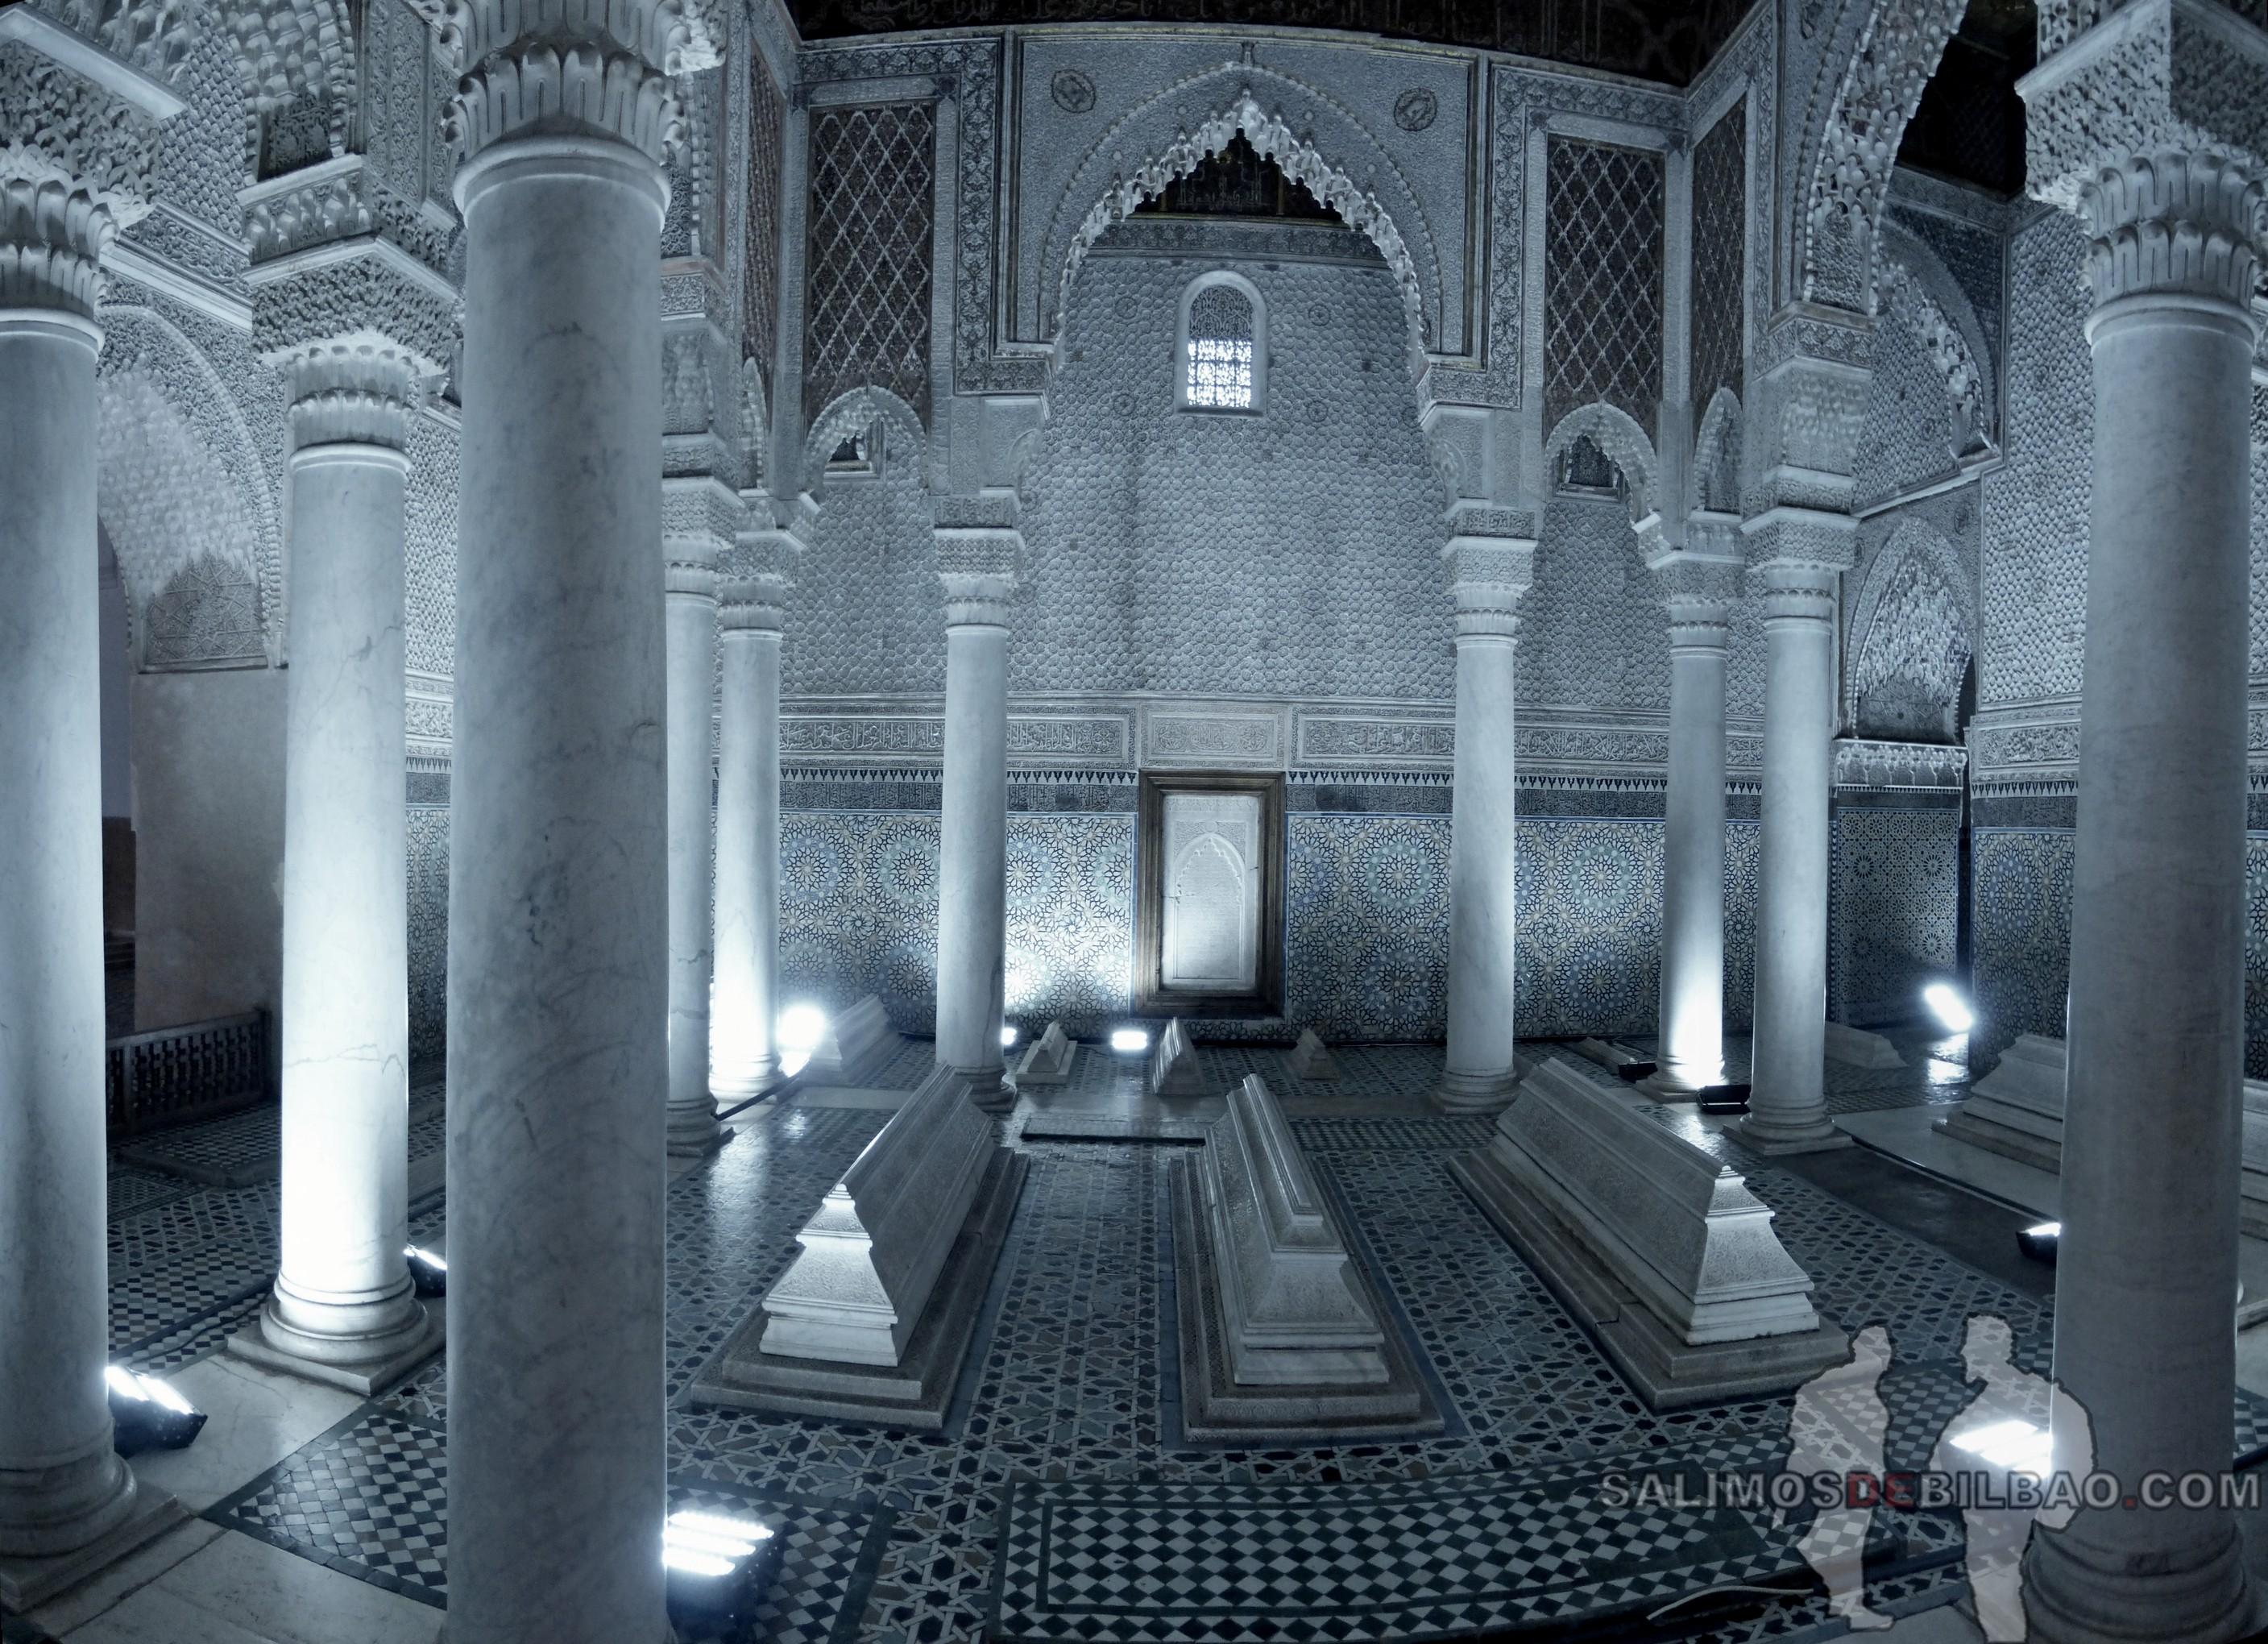 726. Pano, Tumbas saadíes, Marrakech